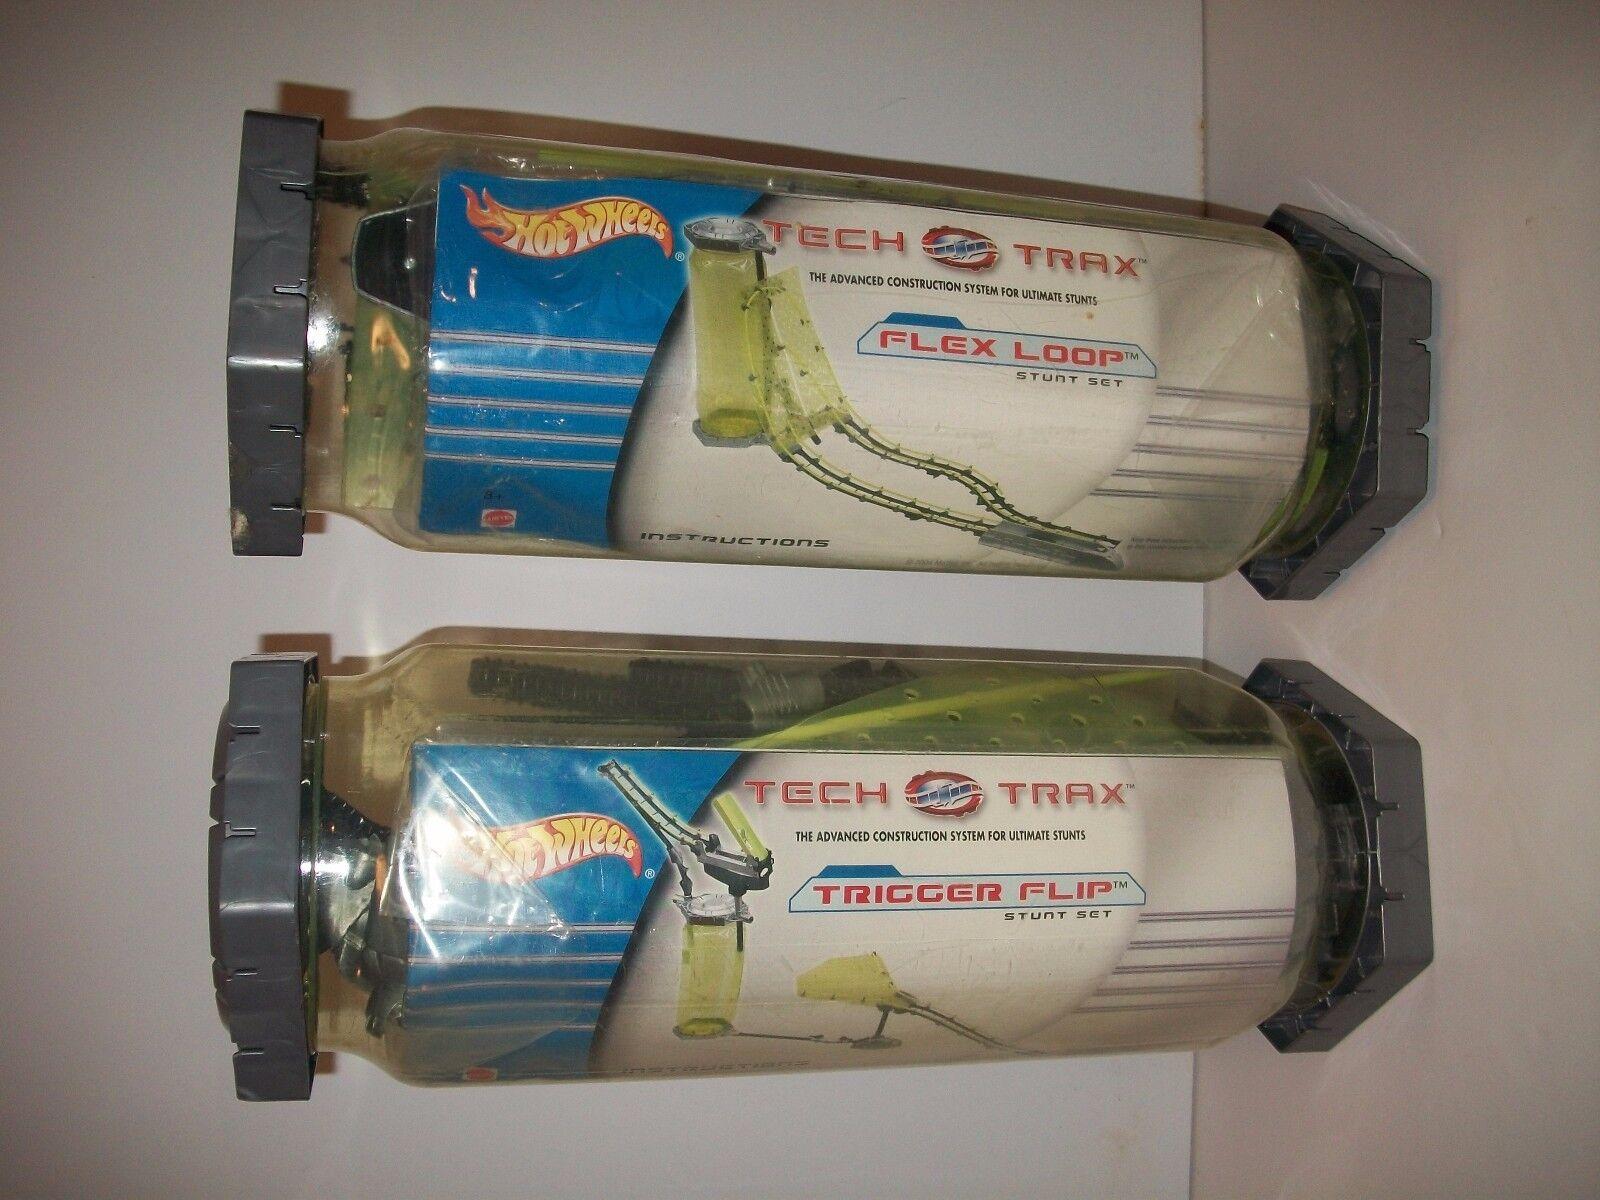 NEW & RARE  HOT WHEELS TECH TRAX SYSTEM STUNT SETS -  x 2   2004 Mattel